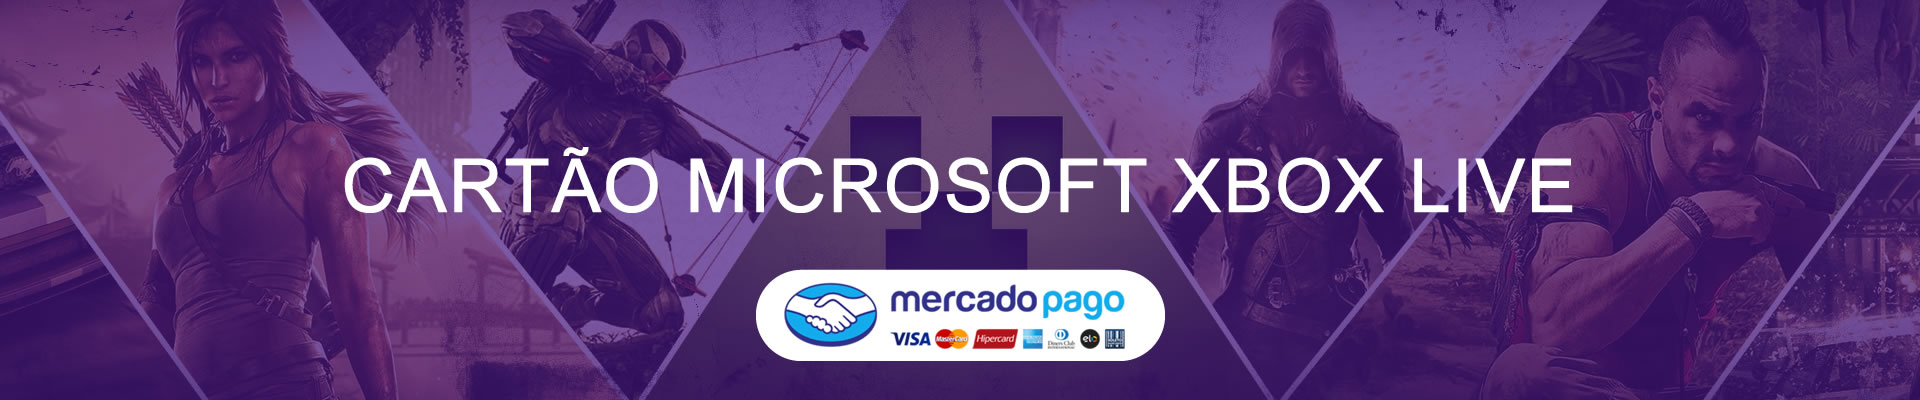 cartao-microsft-xbox-live